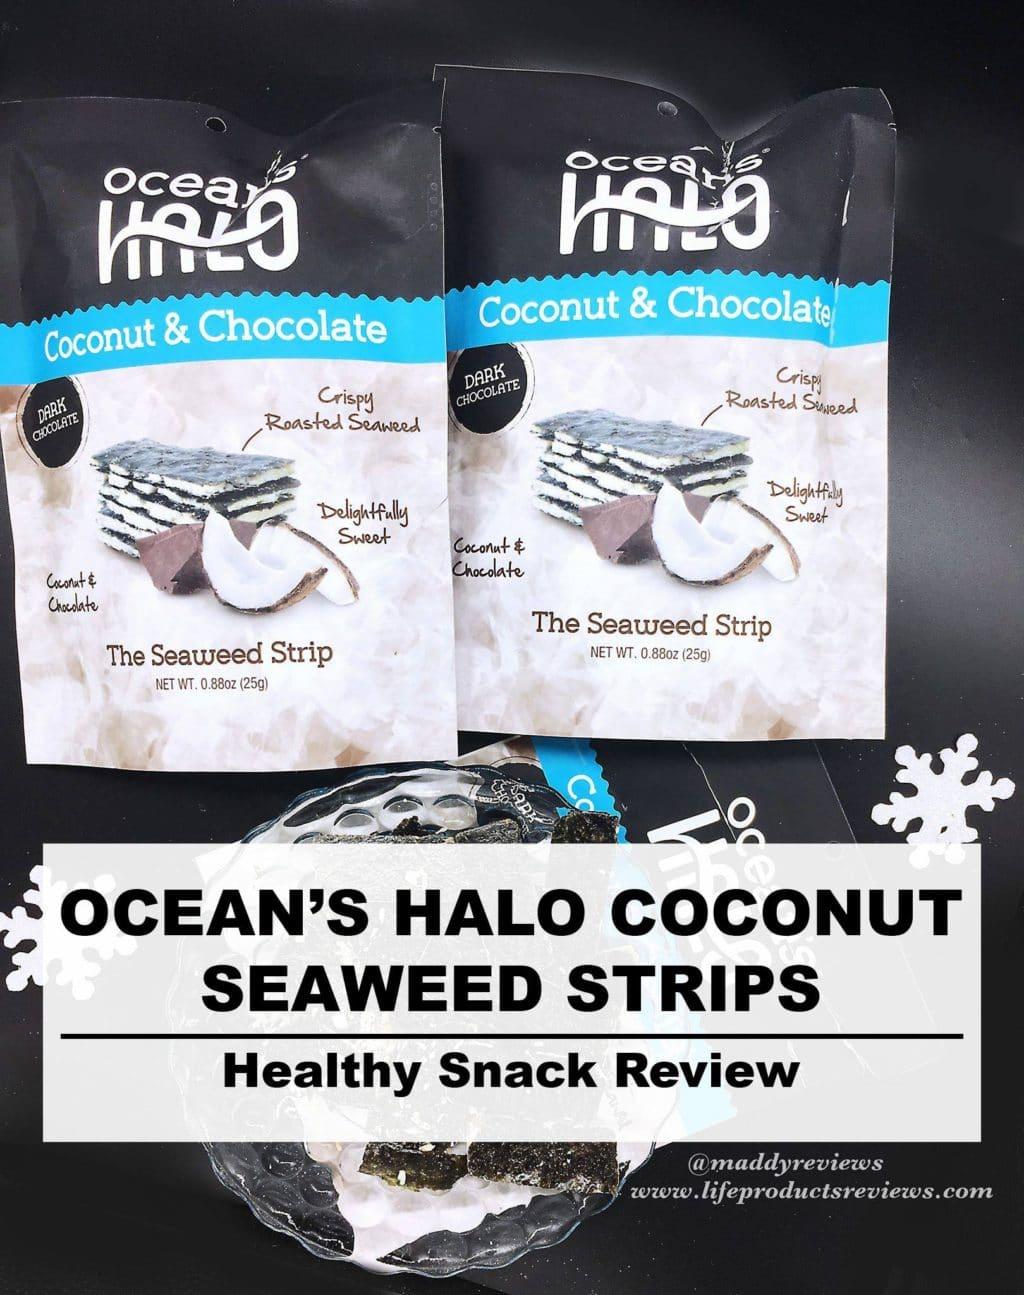 Vegan-Nongmo-snacks-Oceans-halo-seaweed-strip-snack-treat-dessert-healthy